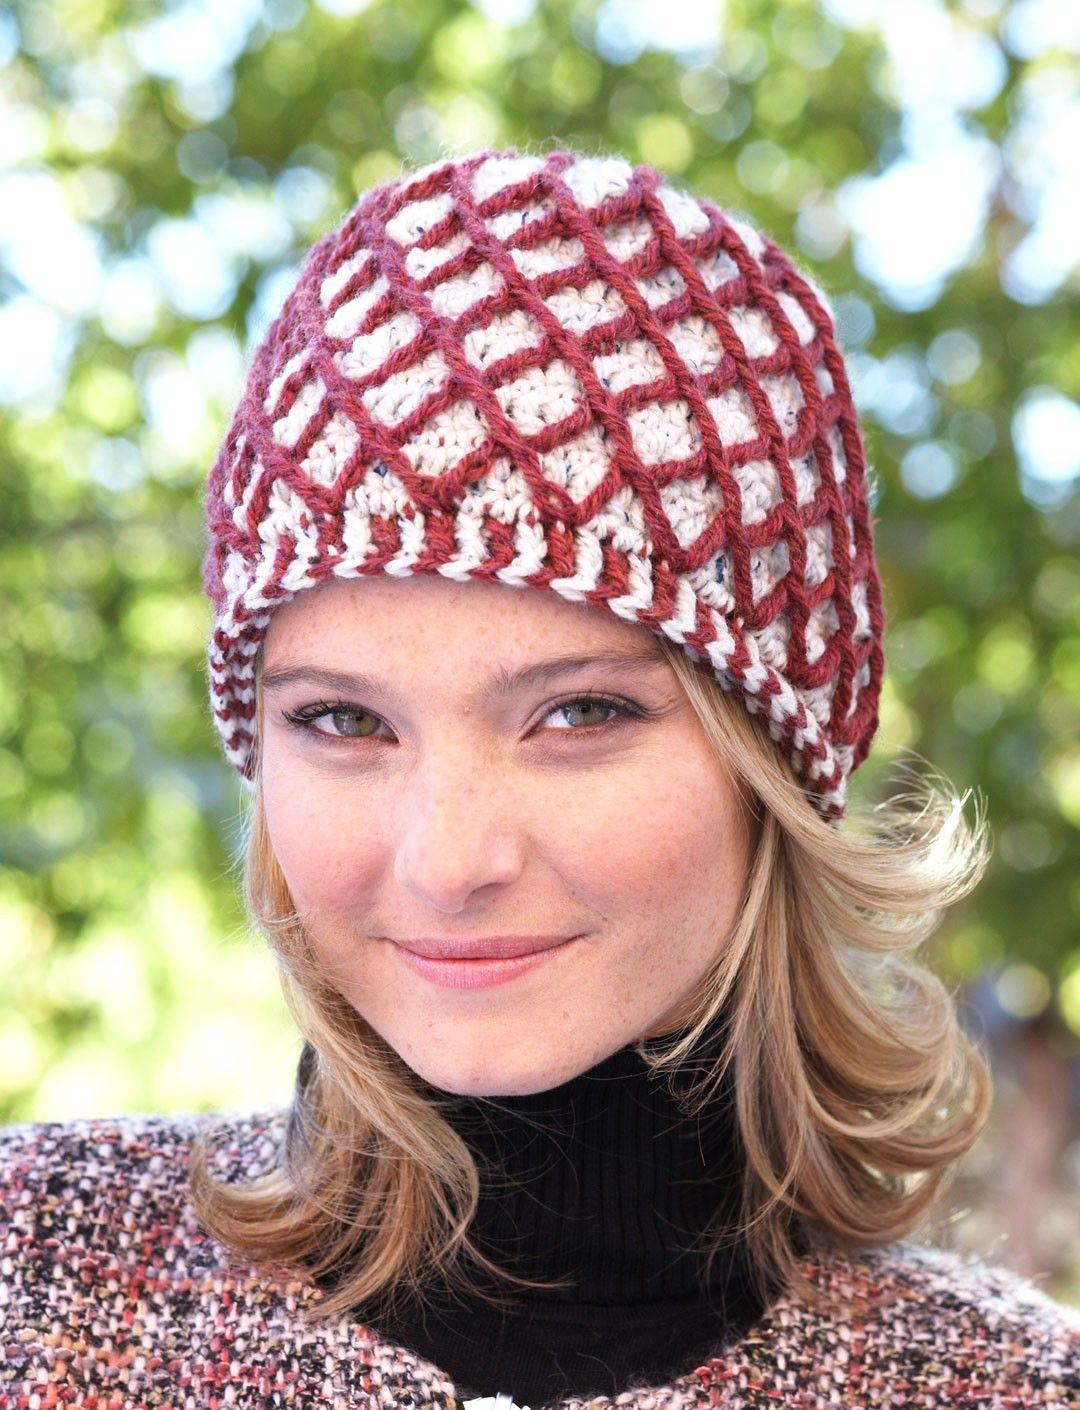 Yarnspirations.com - Patons Lattice Hat | Yarnspirations | Craft ...